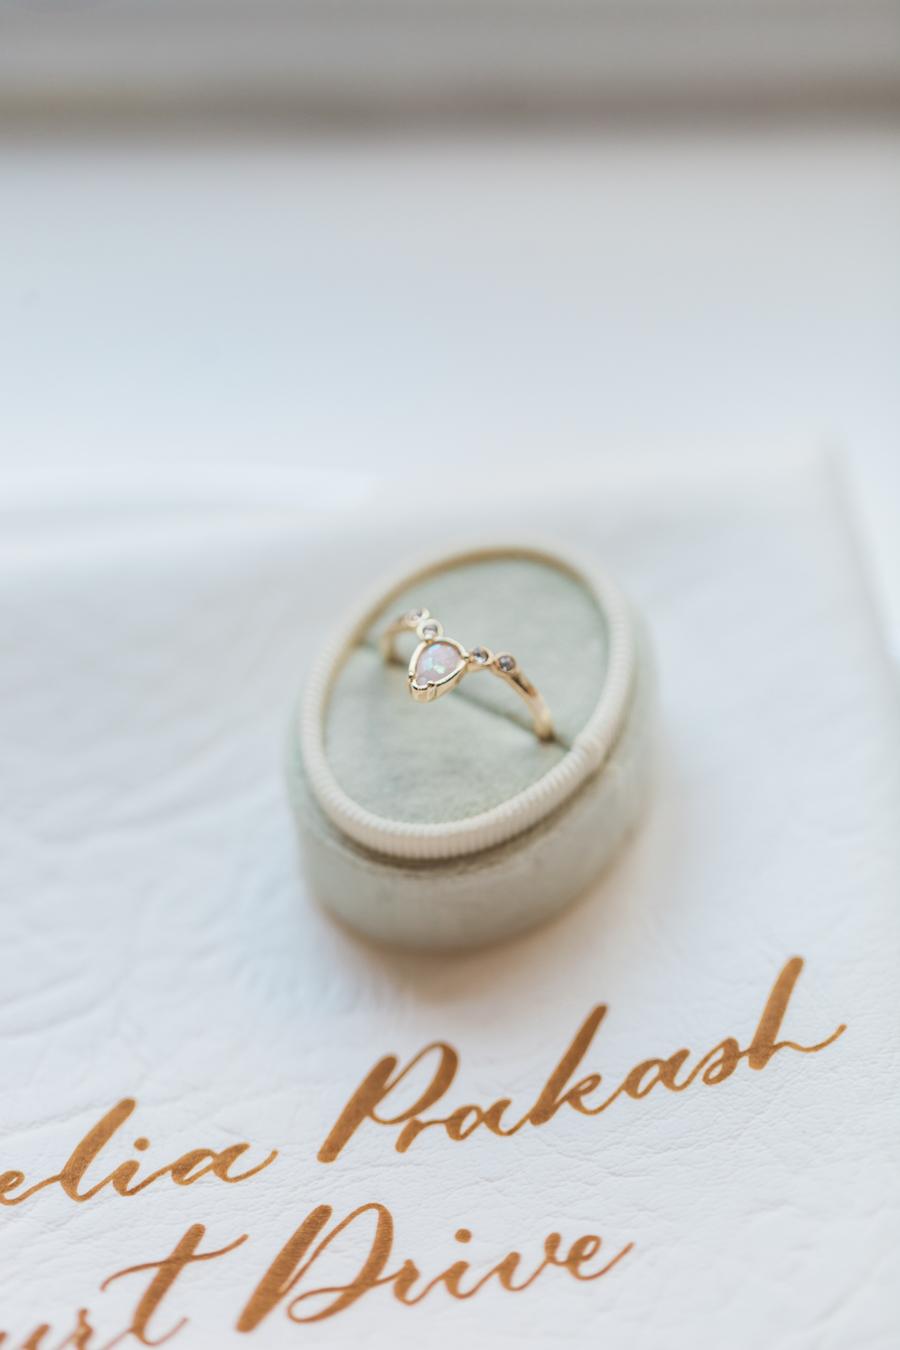 Breathtakingly beautiful - diversity wins in this stunning RSA London wedding editorial! (43)